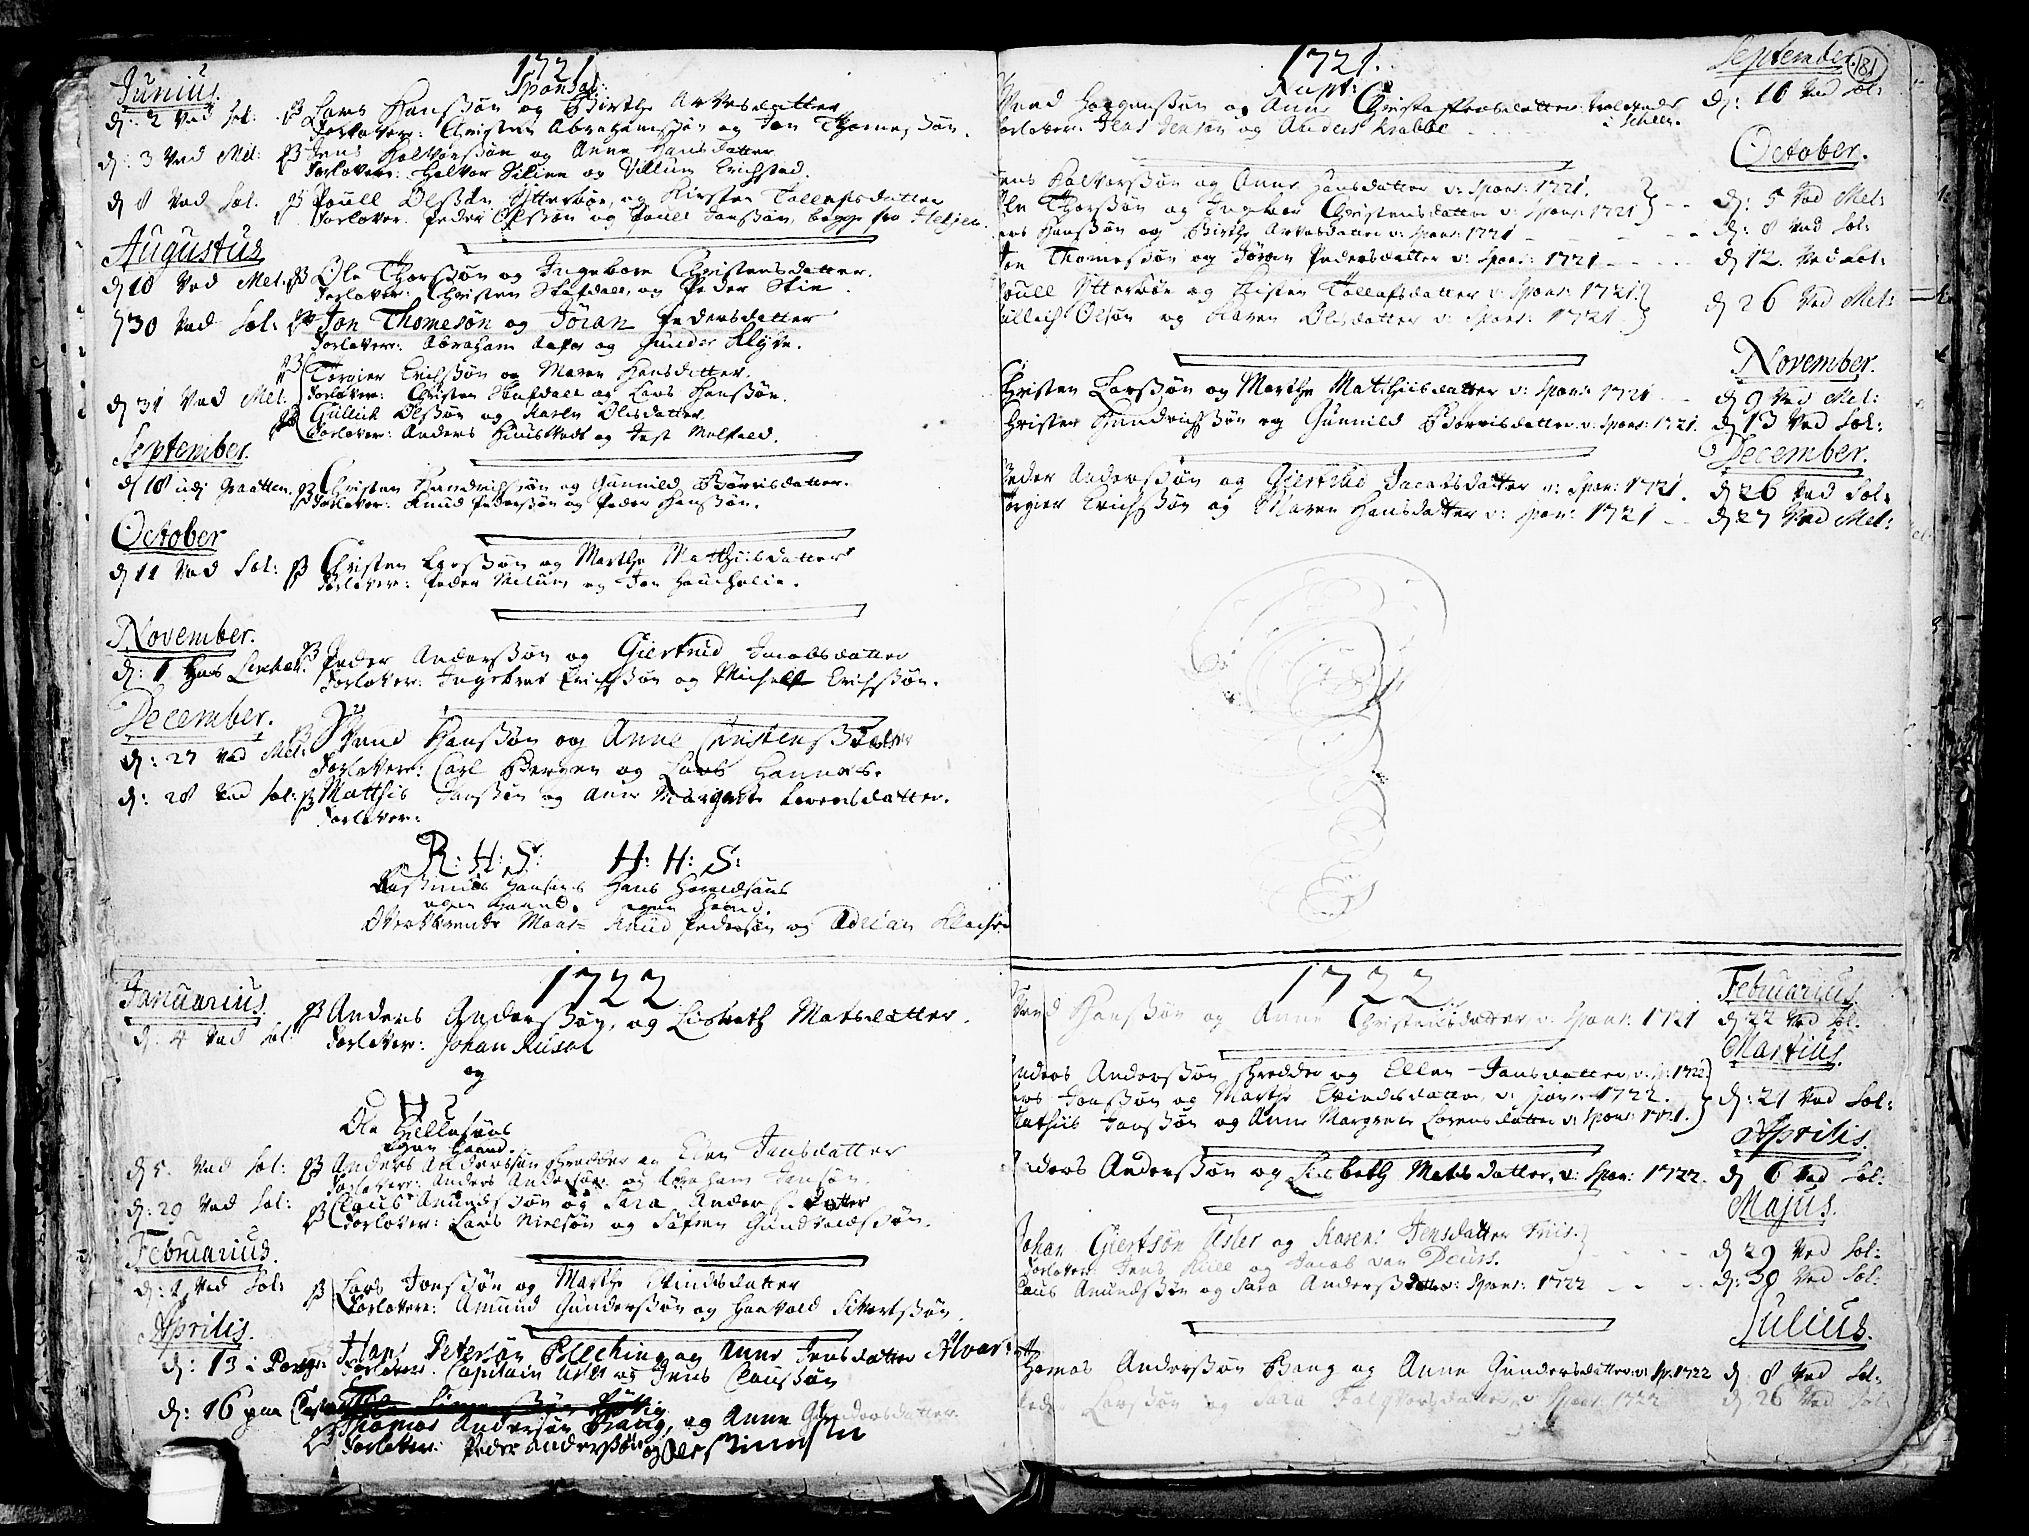 SAKO, Solum kirkebøker, F/Fa/L0002: Ministerialbok nr. I 2, 1713-1761, s. 181